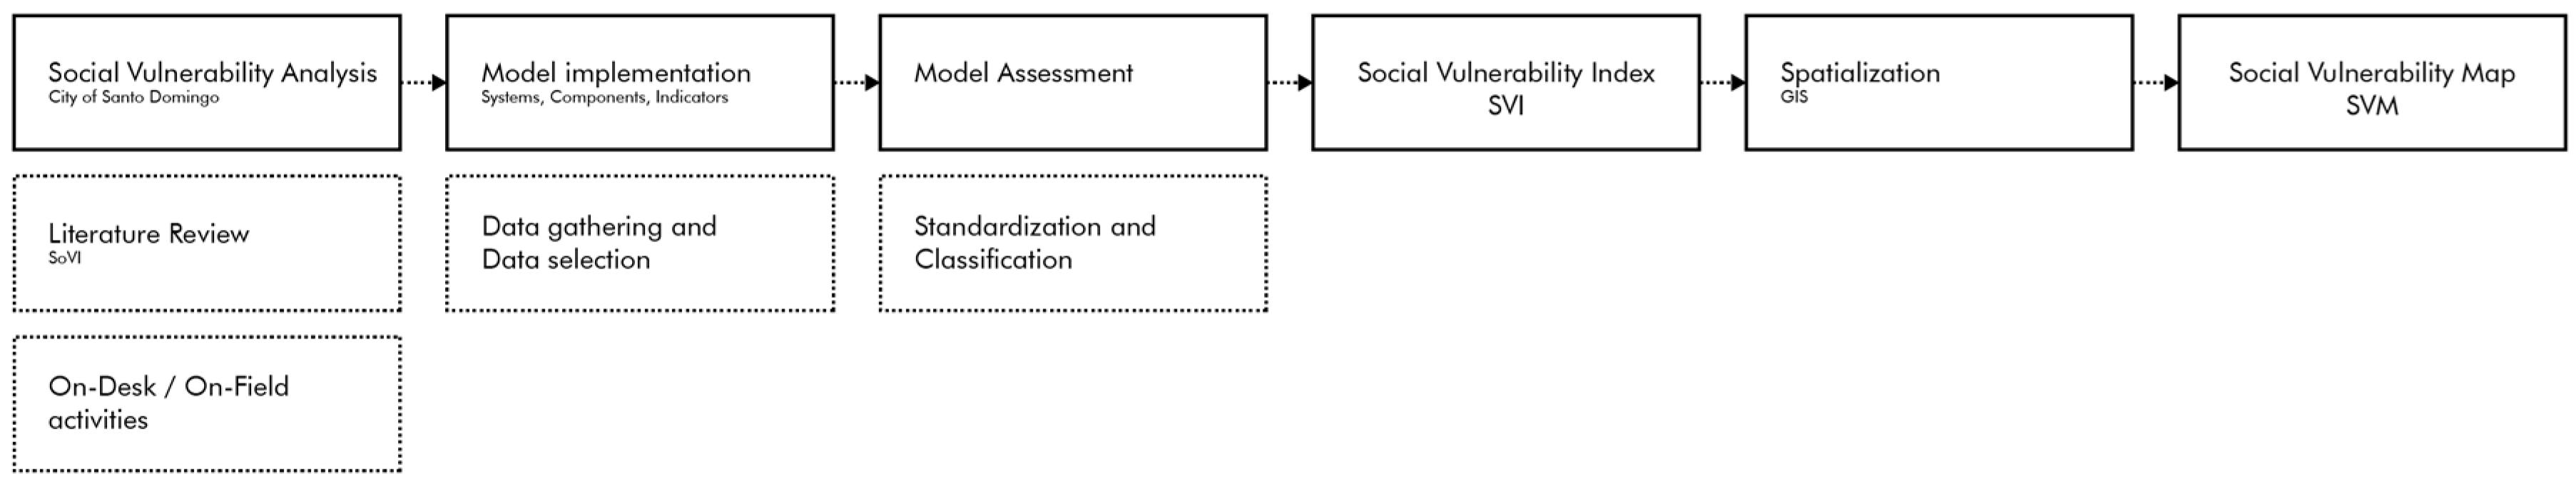 Vinolivin blog conflict resolution and prevention john burton pdf merger fandeluxe Image collections